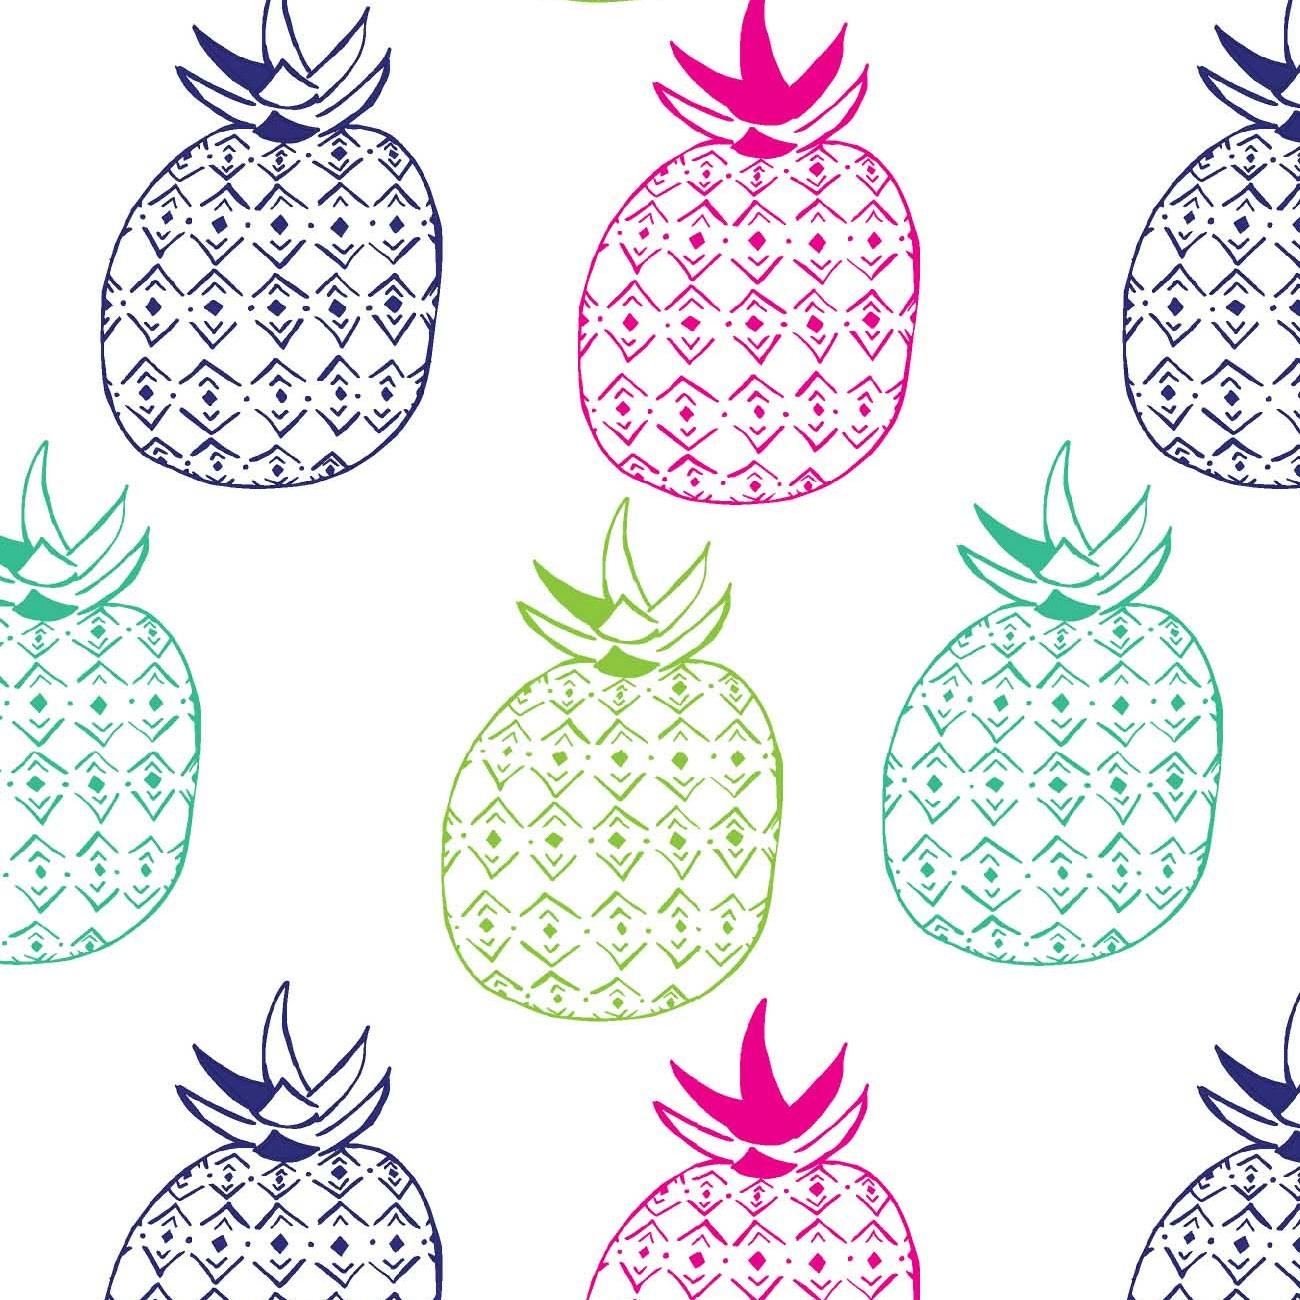 pineapple promo.jpg